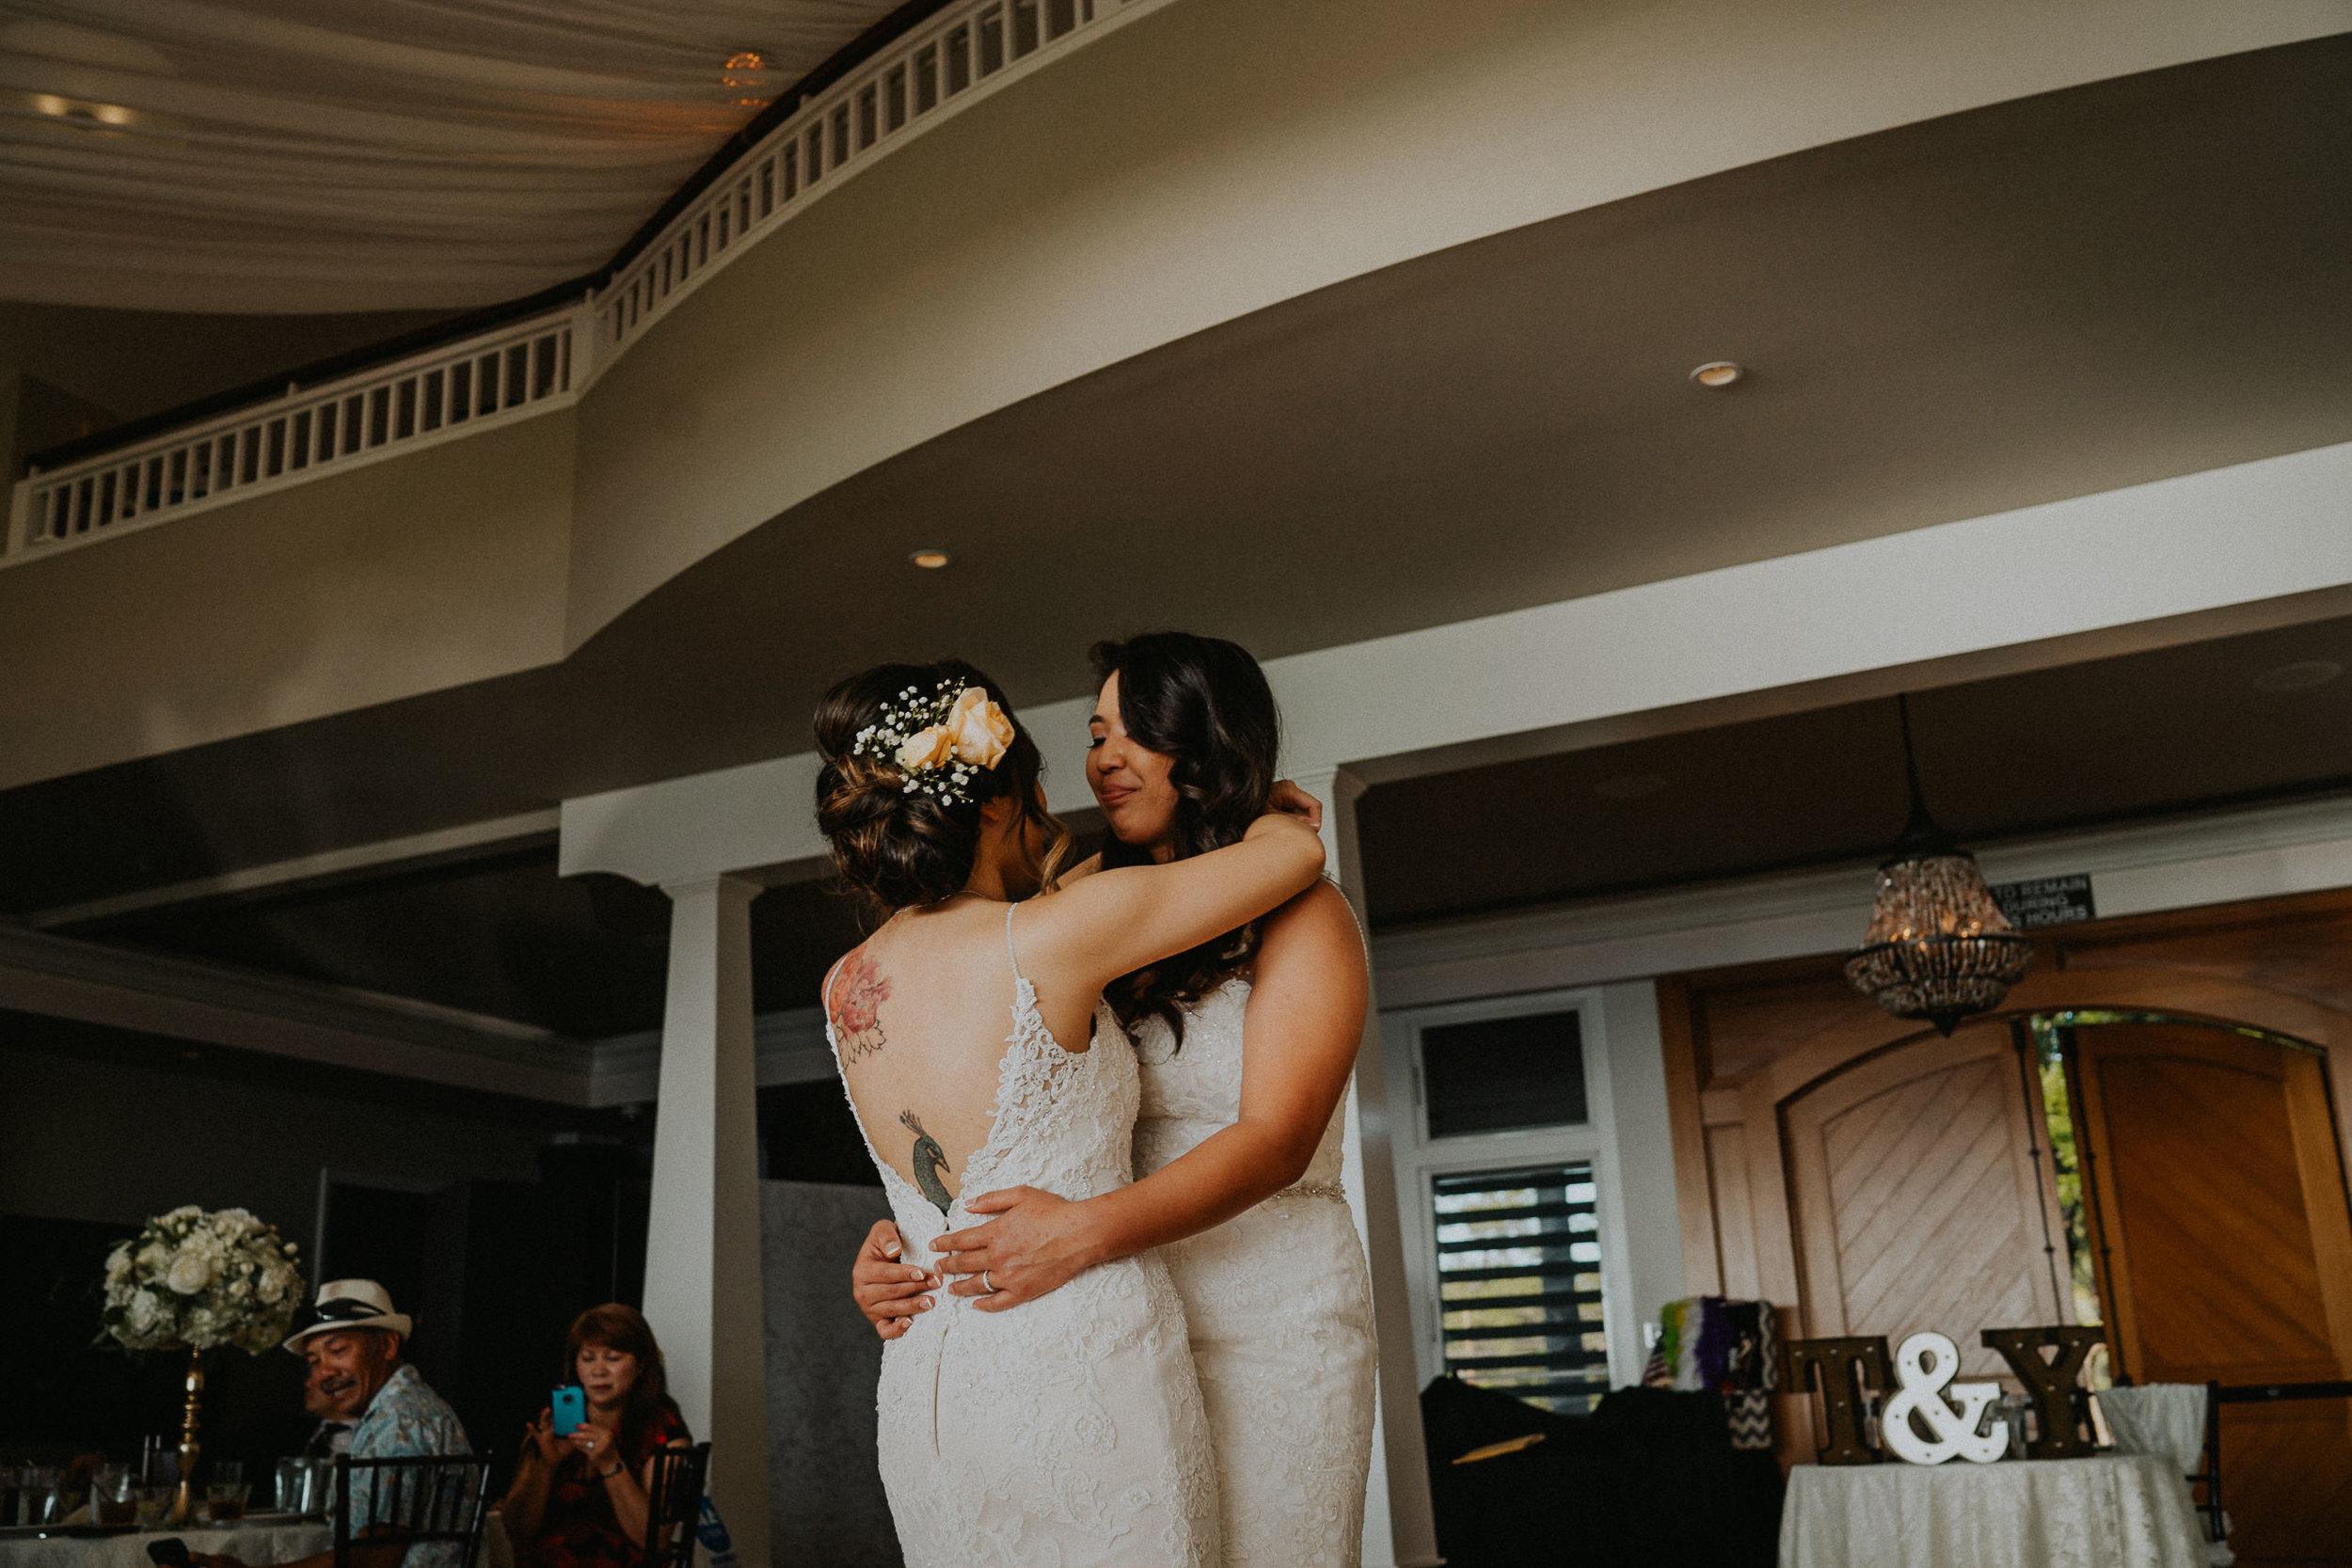 Maui_Destination_wedding_Alfred_Tang-45.jpg